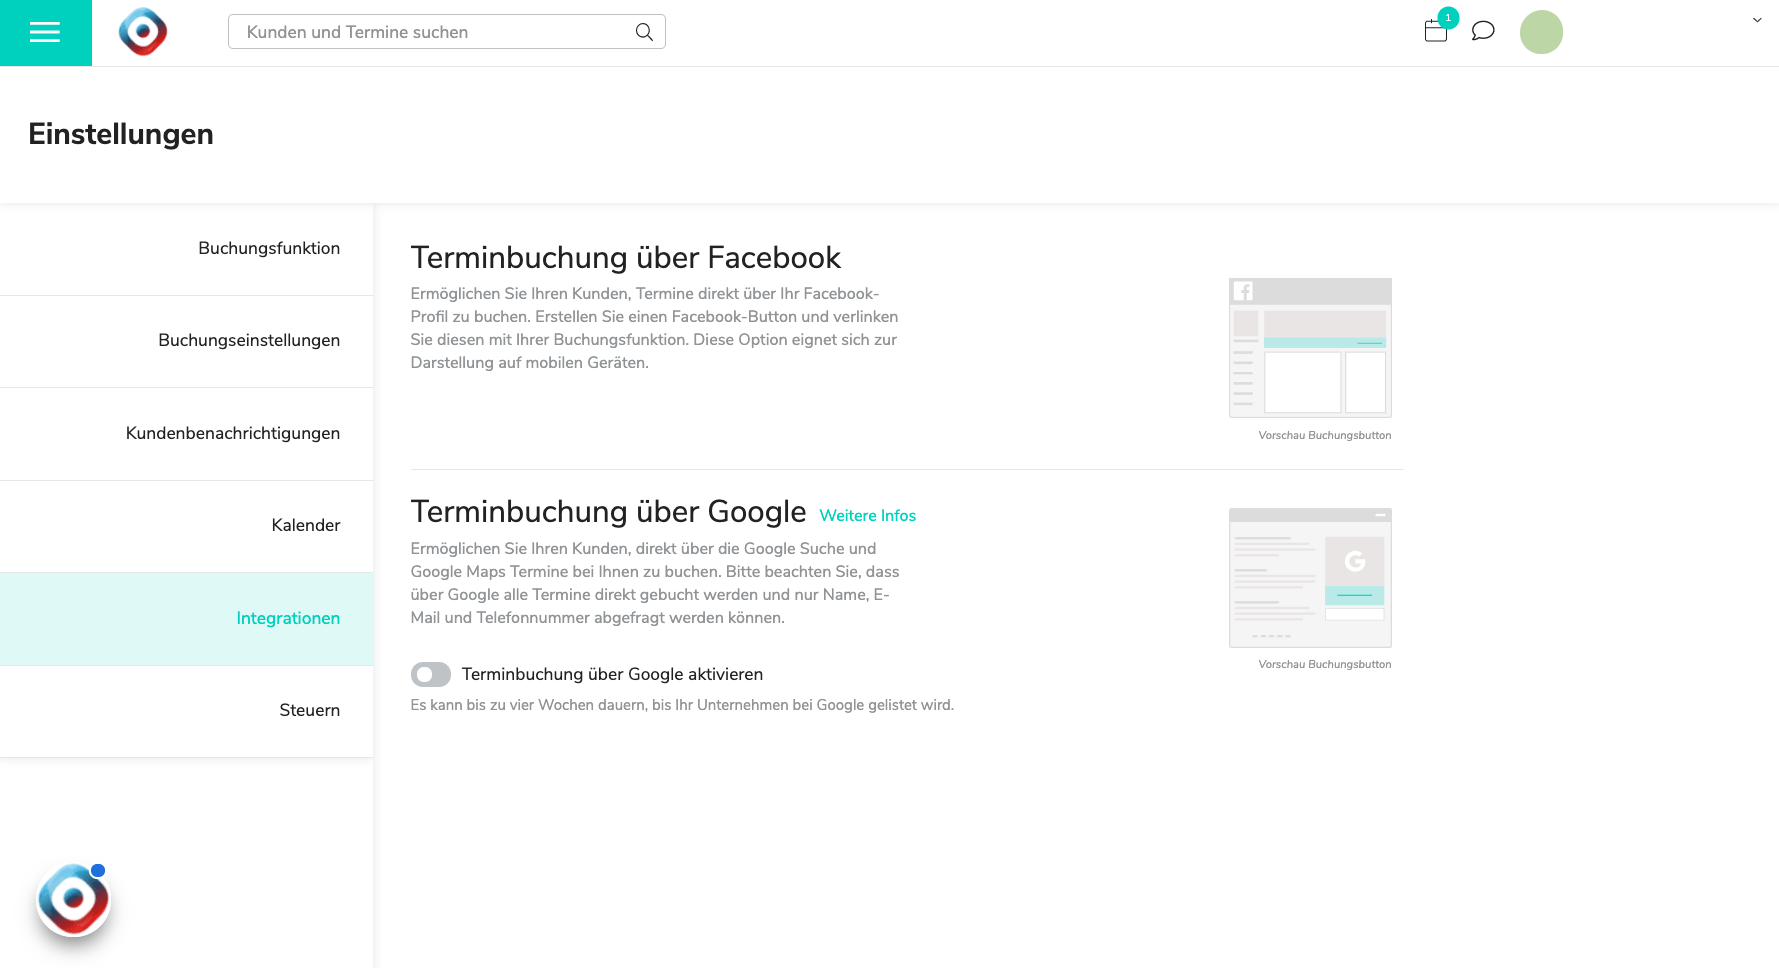 google-integration